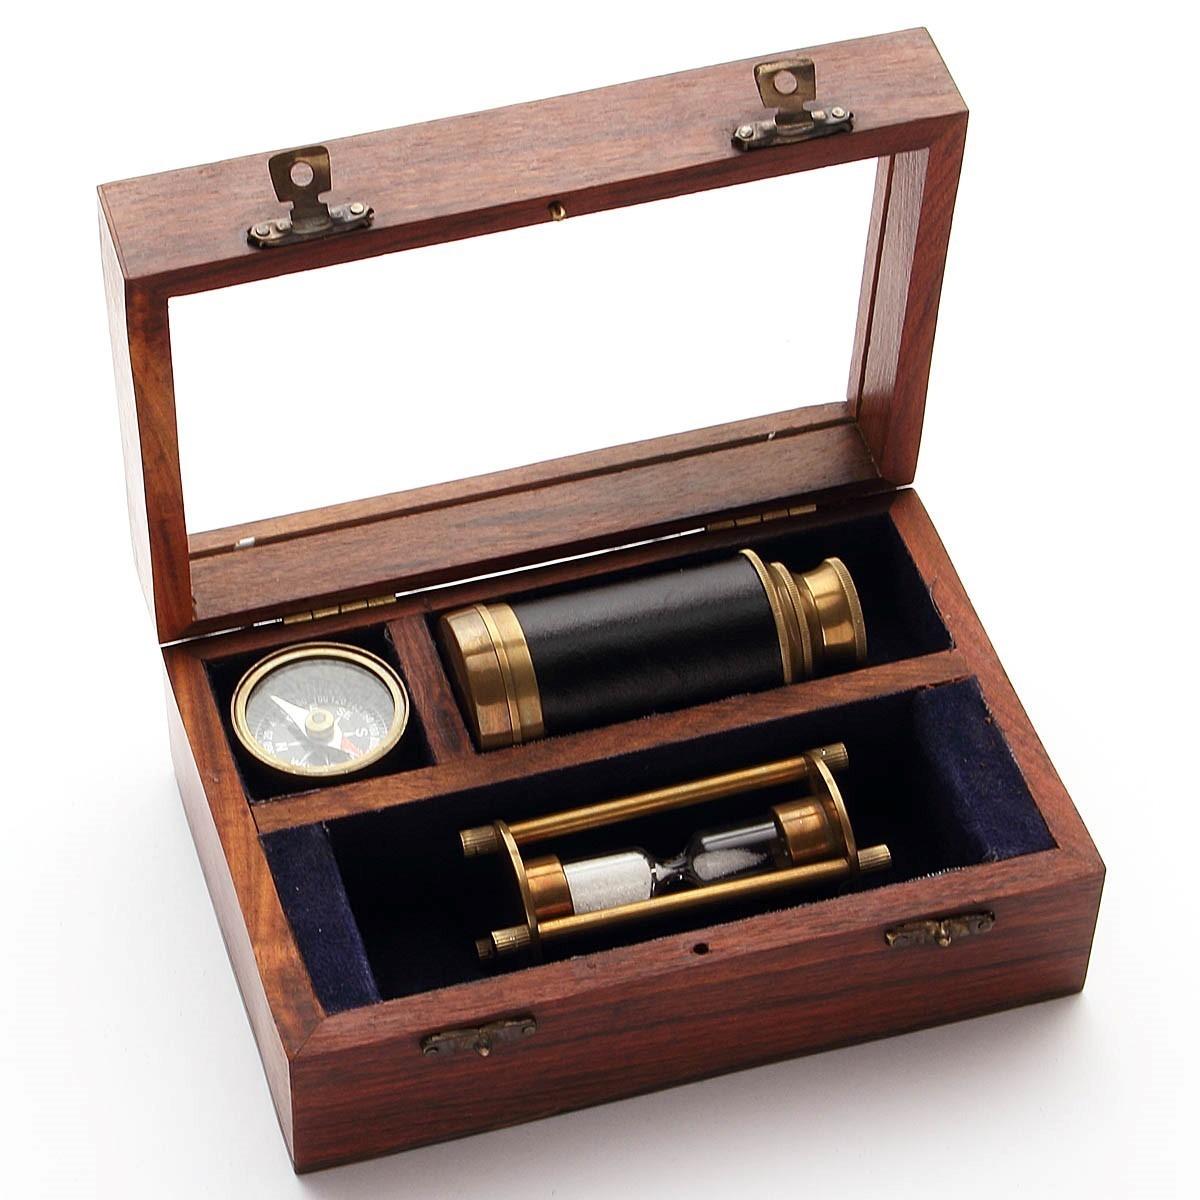 Picture of Captains Navigation Kit